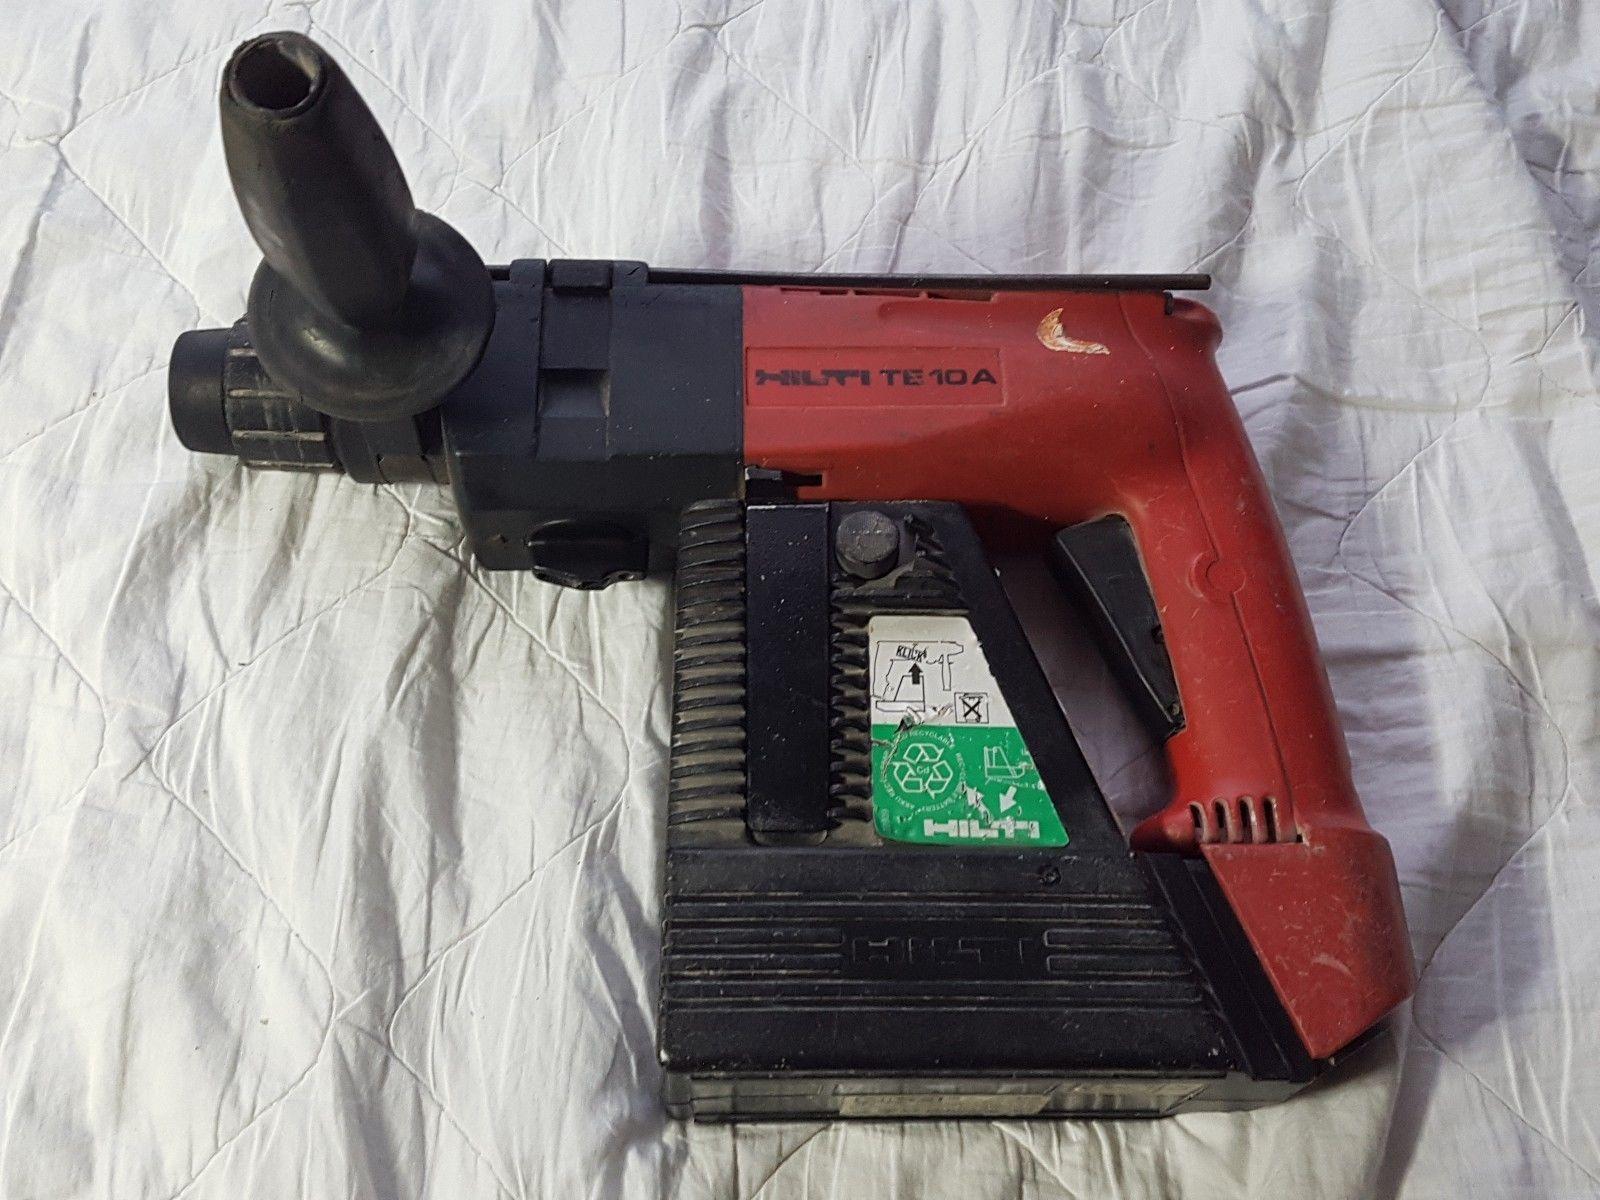 hilti te10 a akku bohrhammer bohrmaschine schlagbohrmaschinesparen25